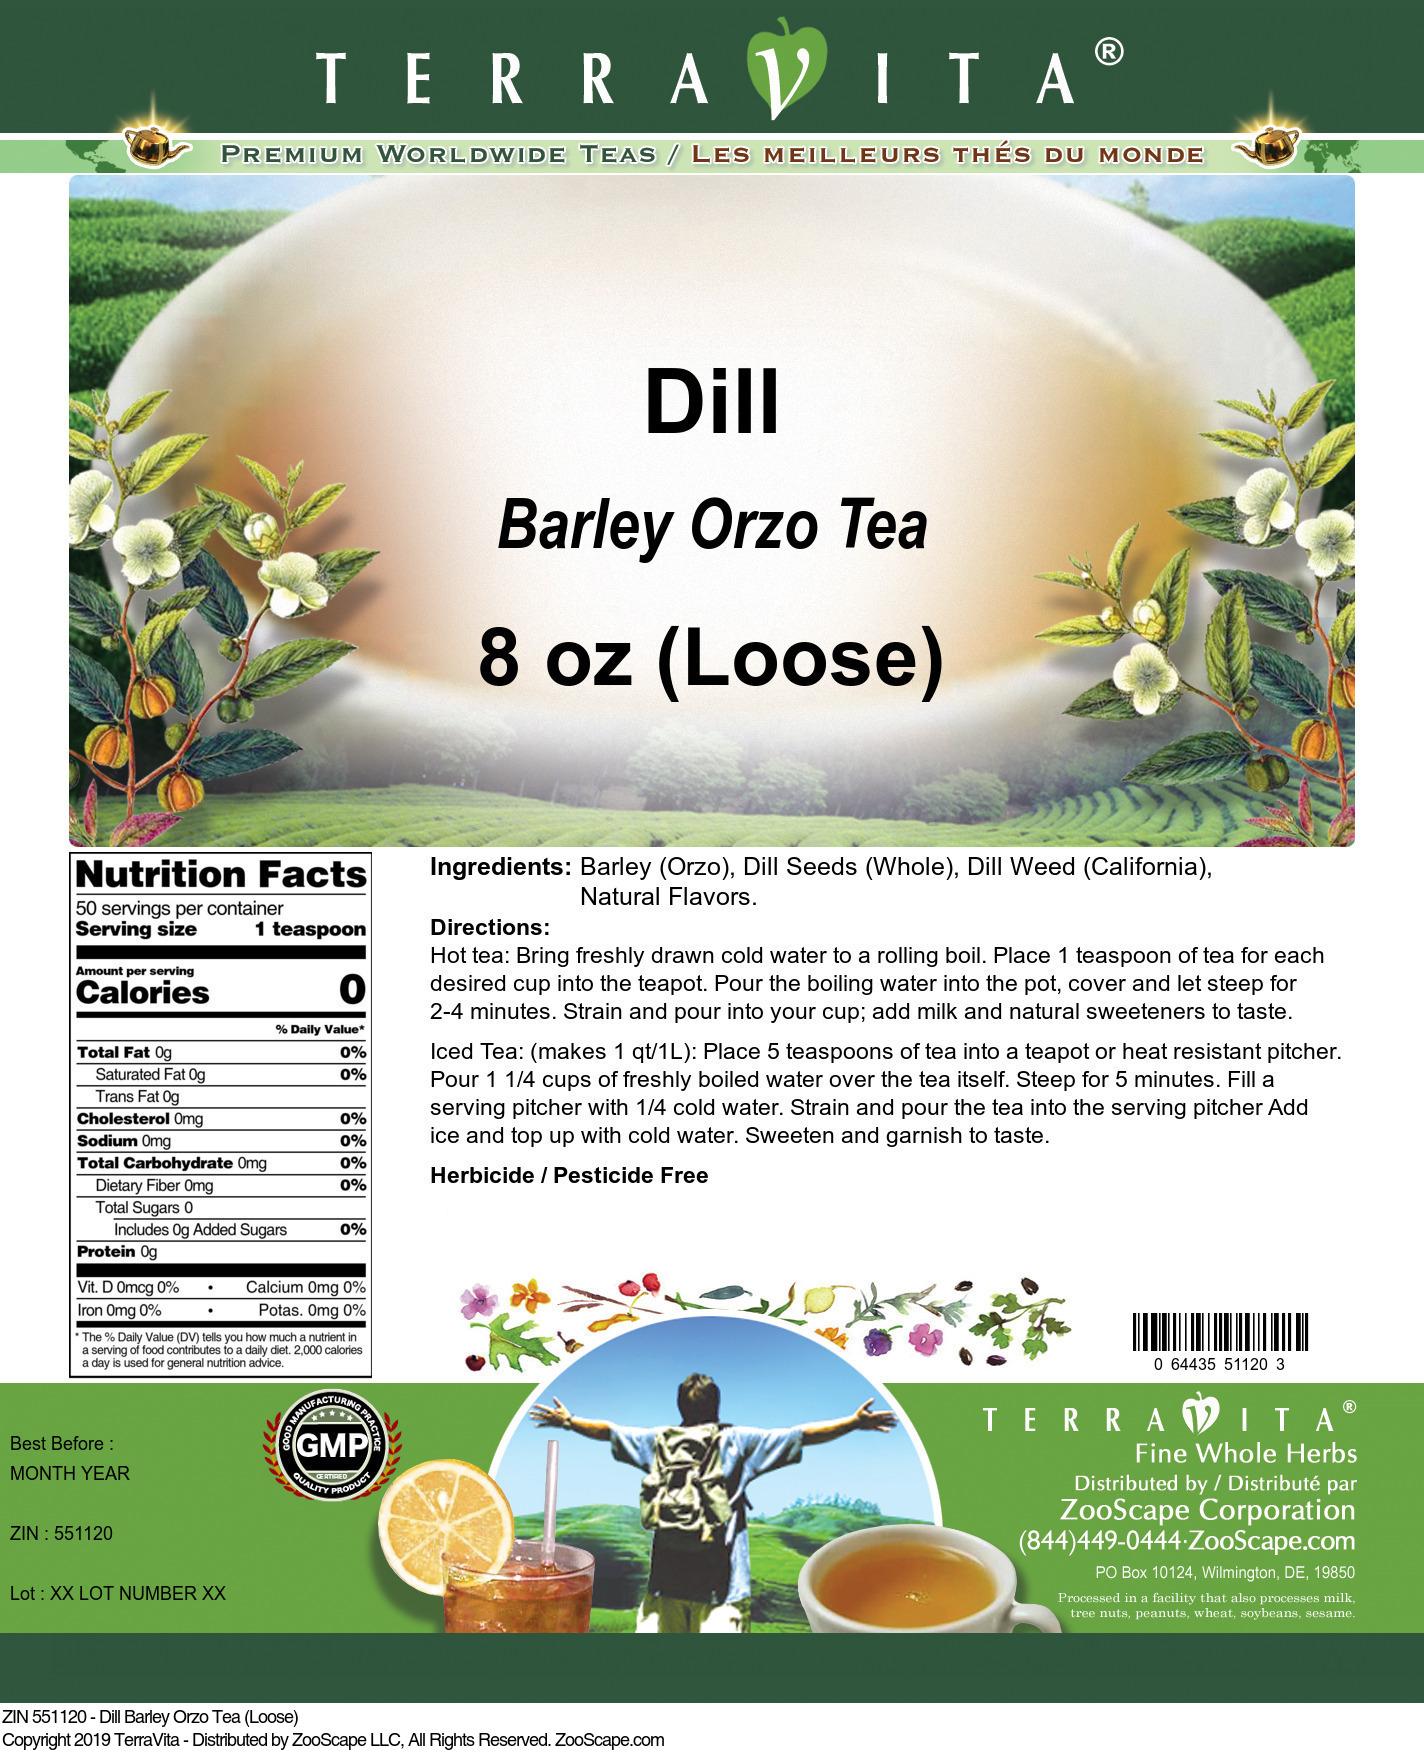 Dill Barley Orzo Tea (Loose)